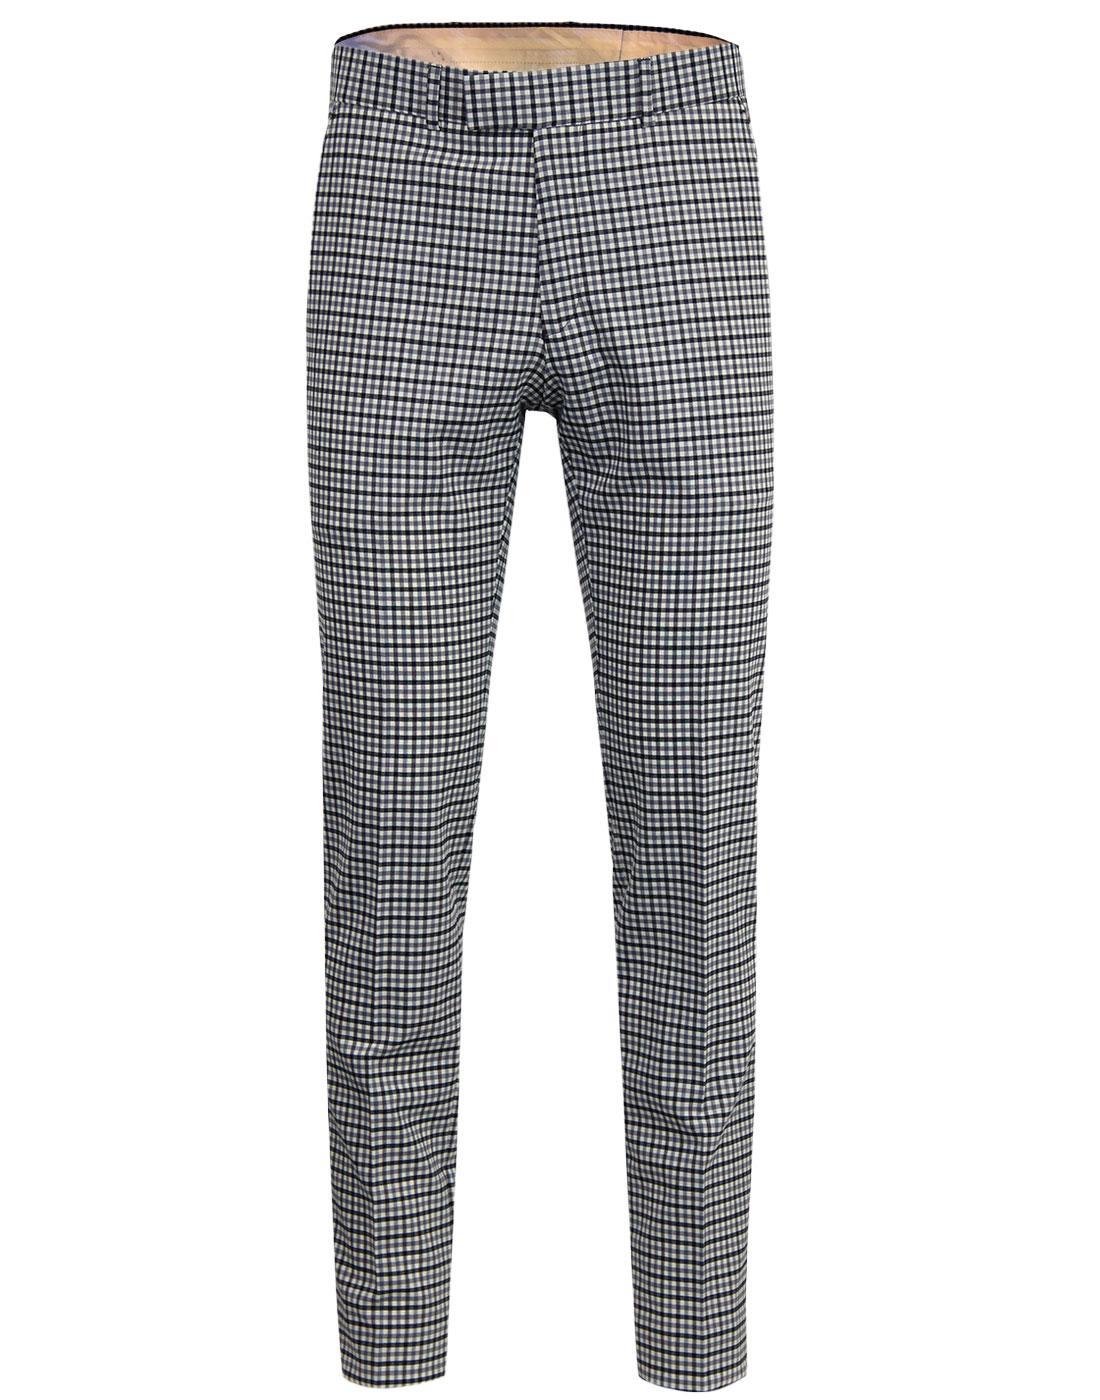 Radisson GIBSON LONDON Mod Gingham Slim Trousers